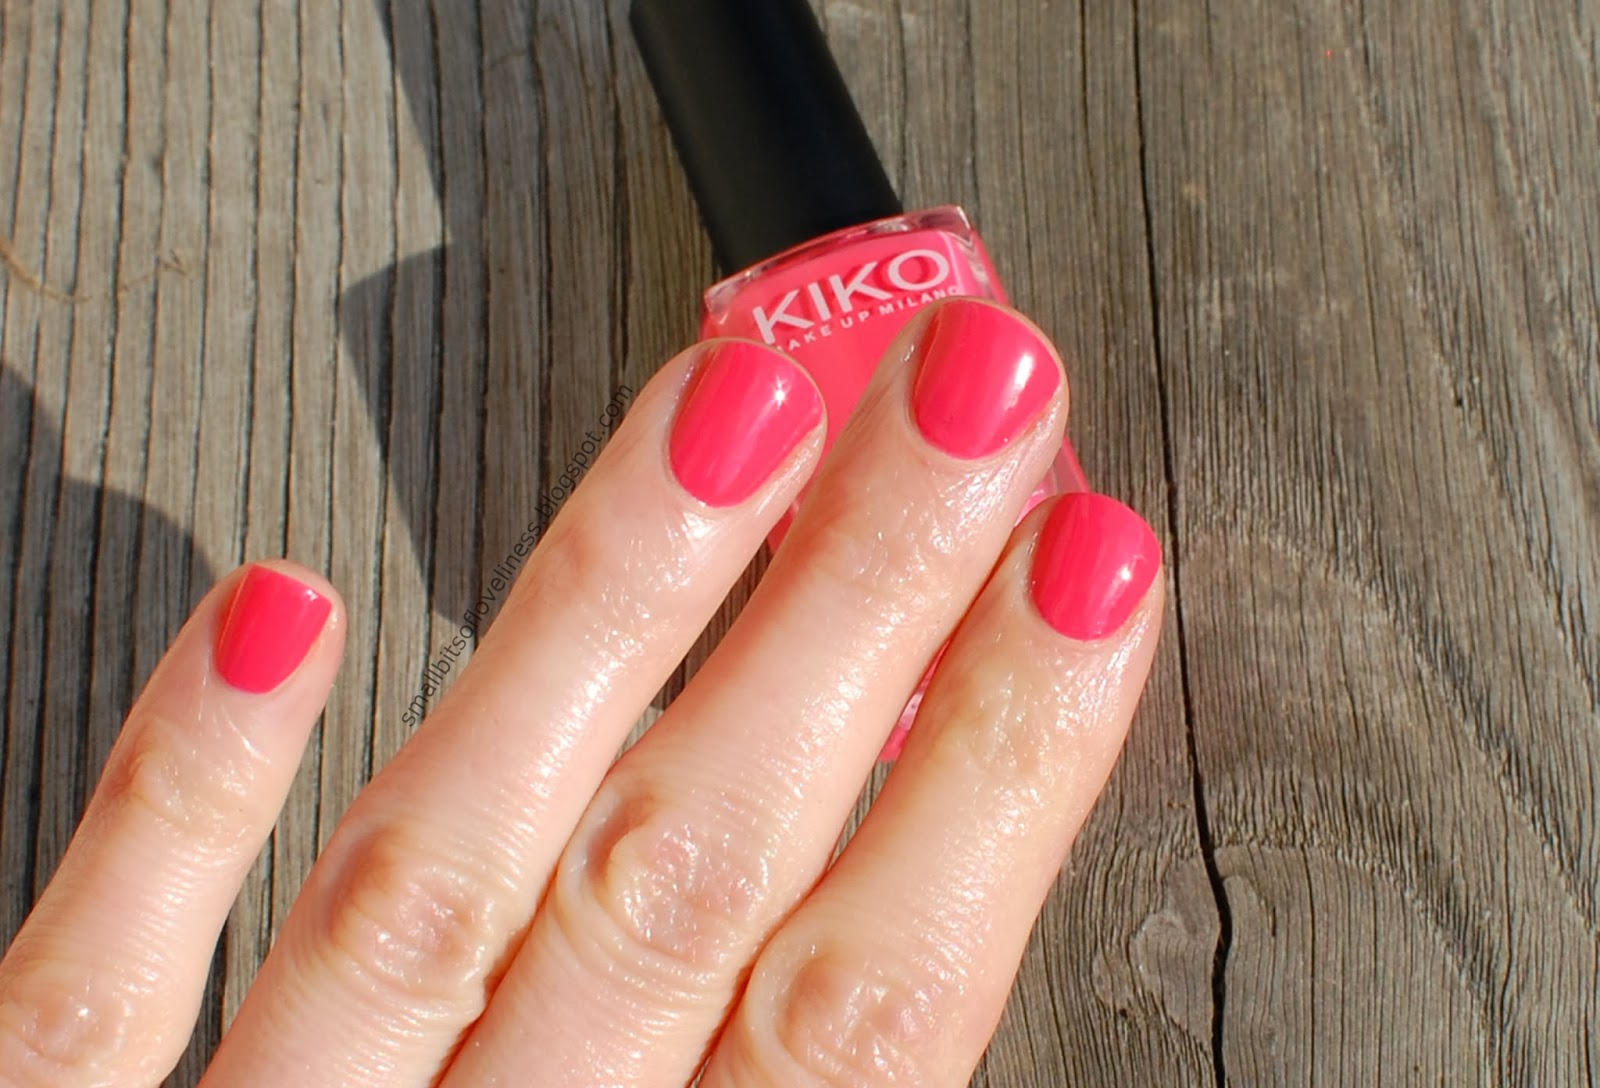 Kiko Nail Polish 360